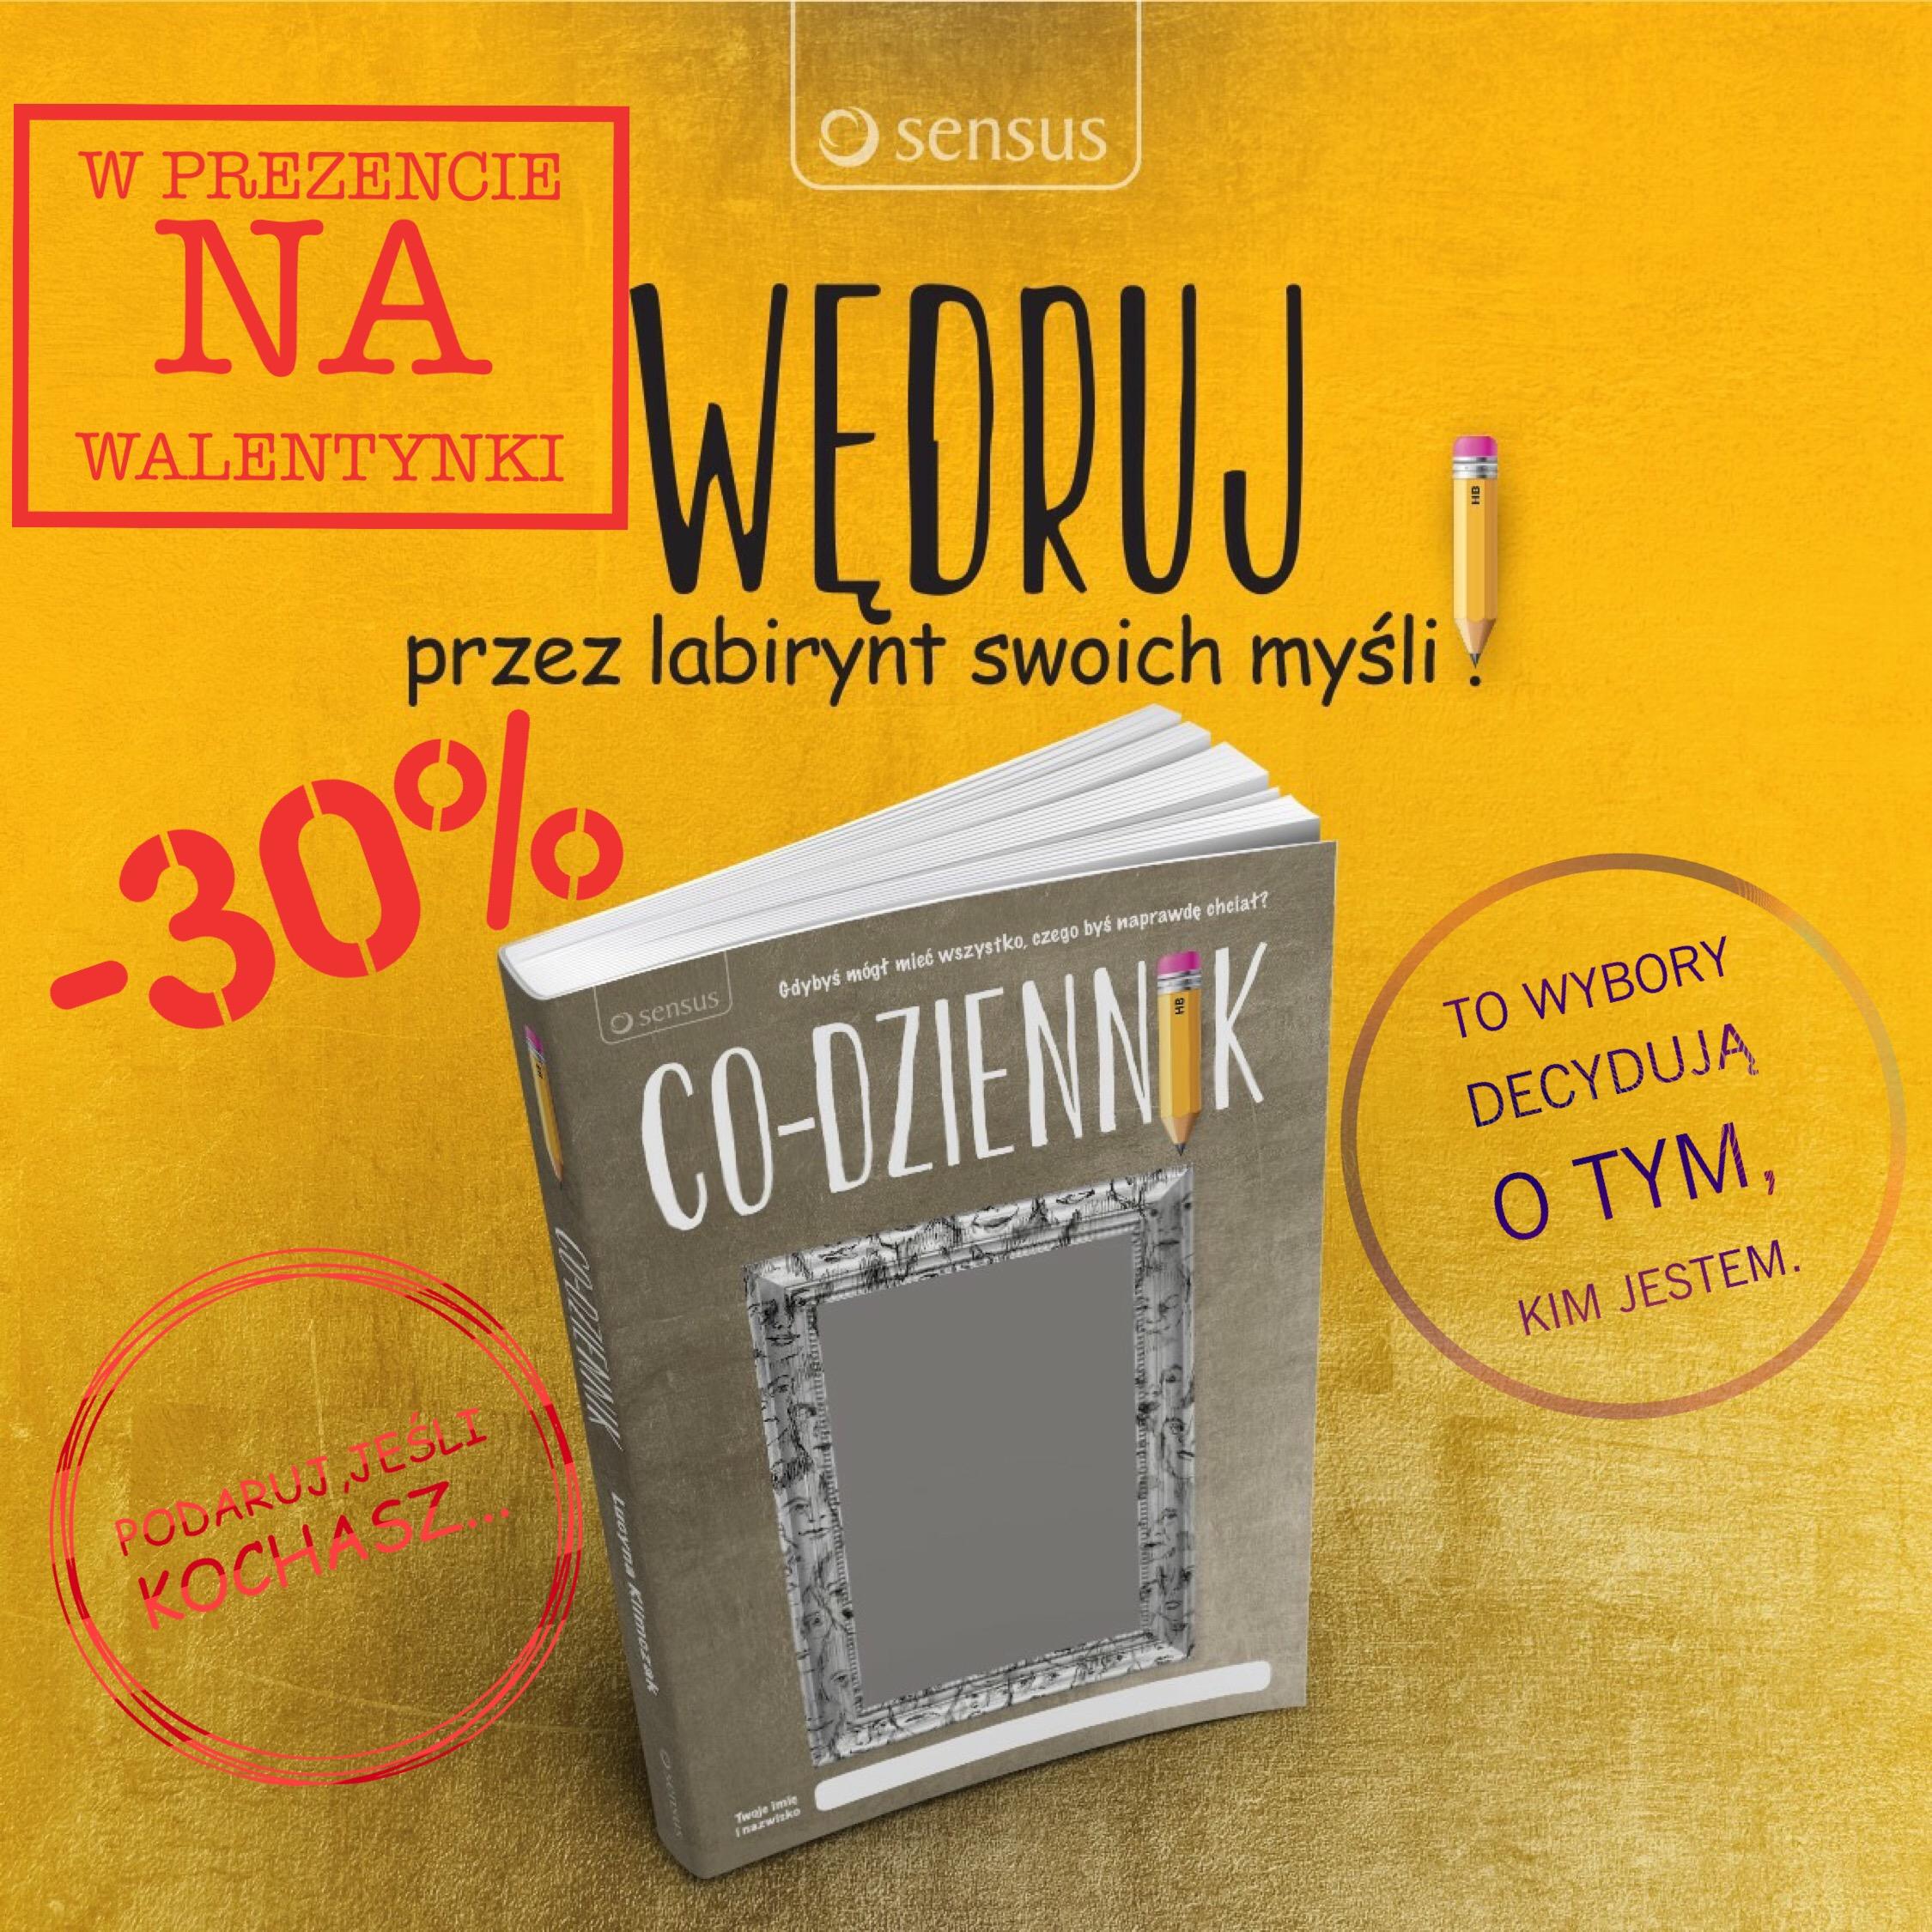 """Co-dziennik"" na Walentynki @ Sensus"